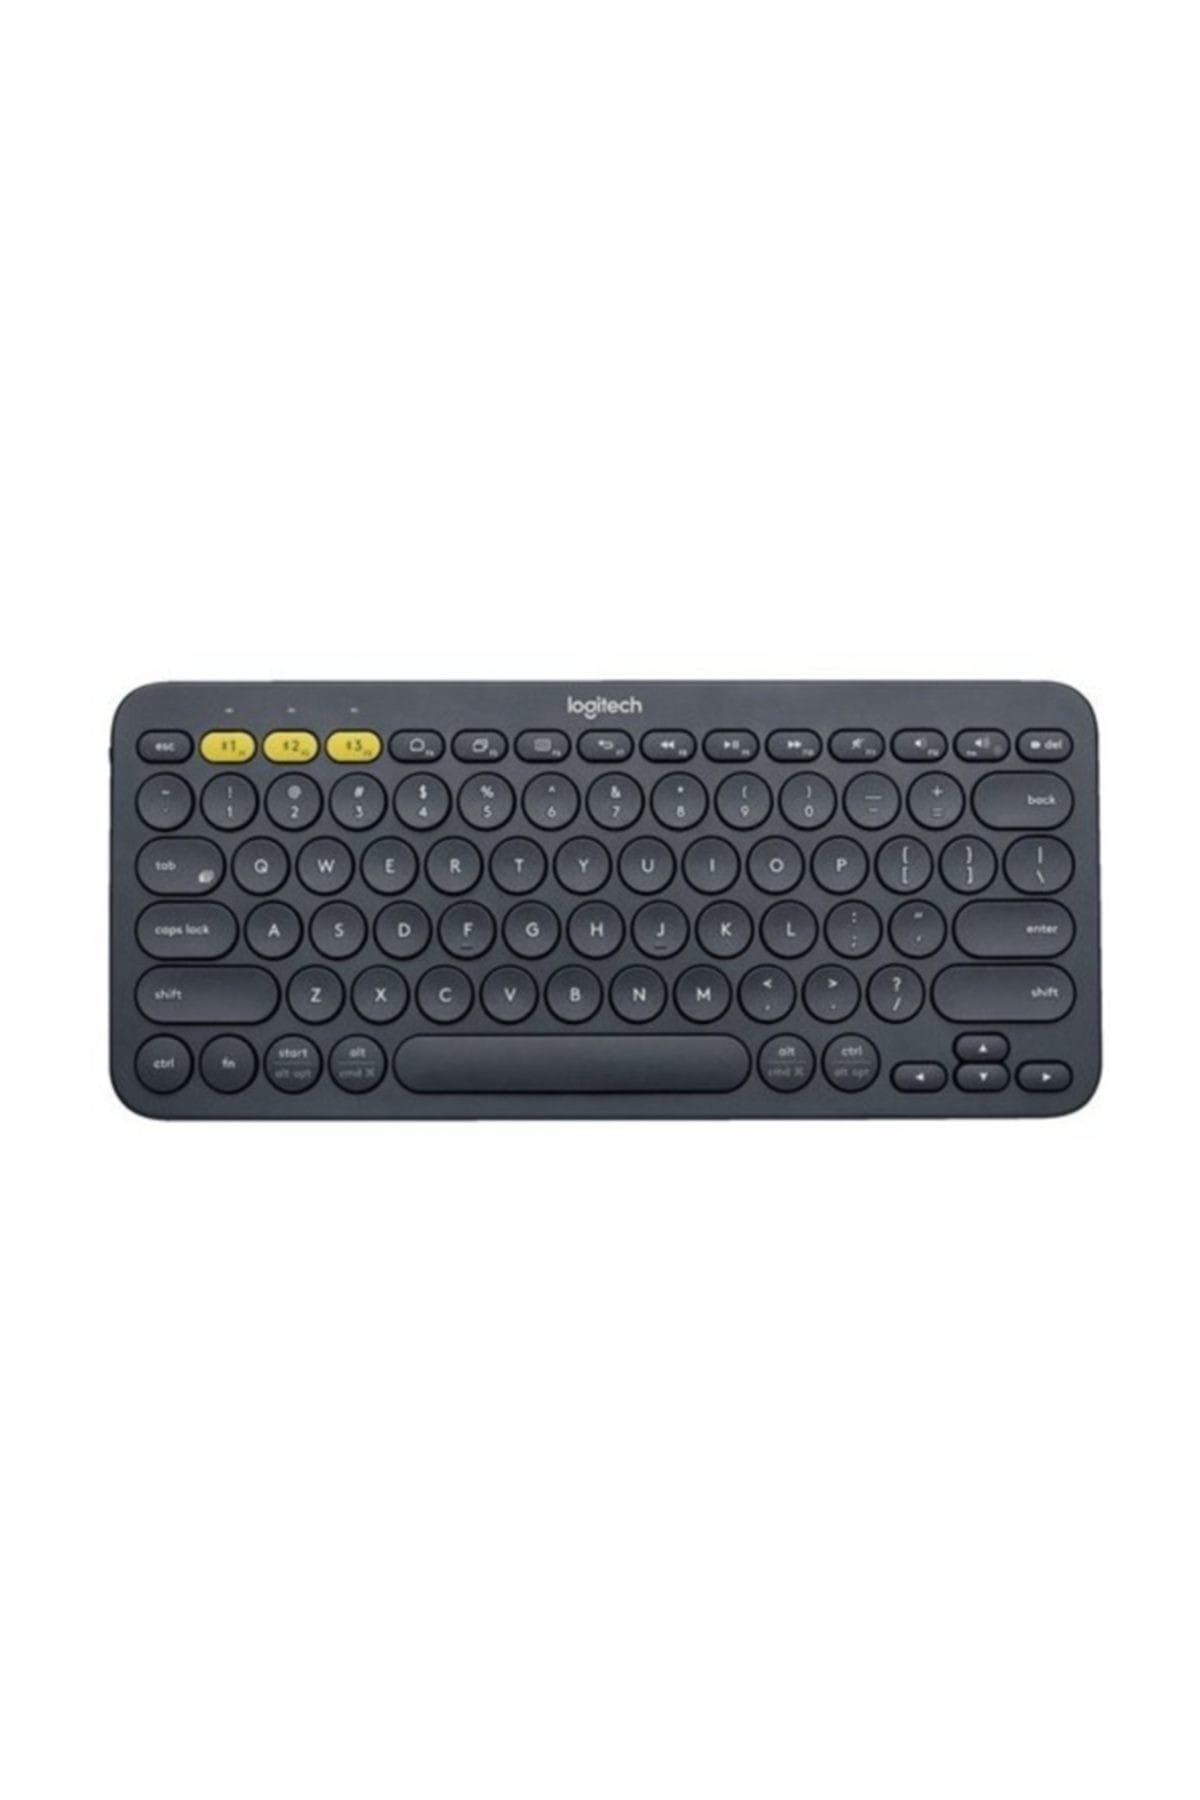 logitech K380 Bluetooth Siyah Klavye 920-007586 1